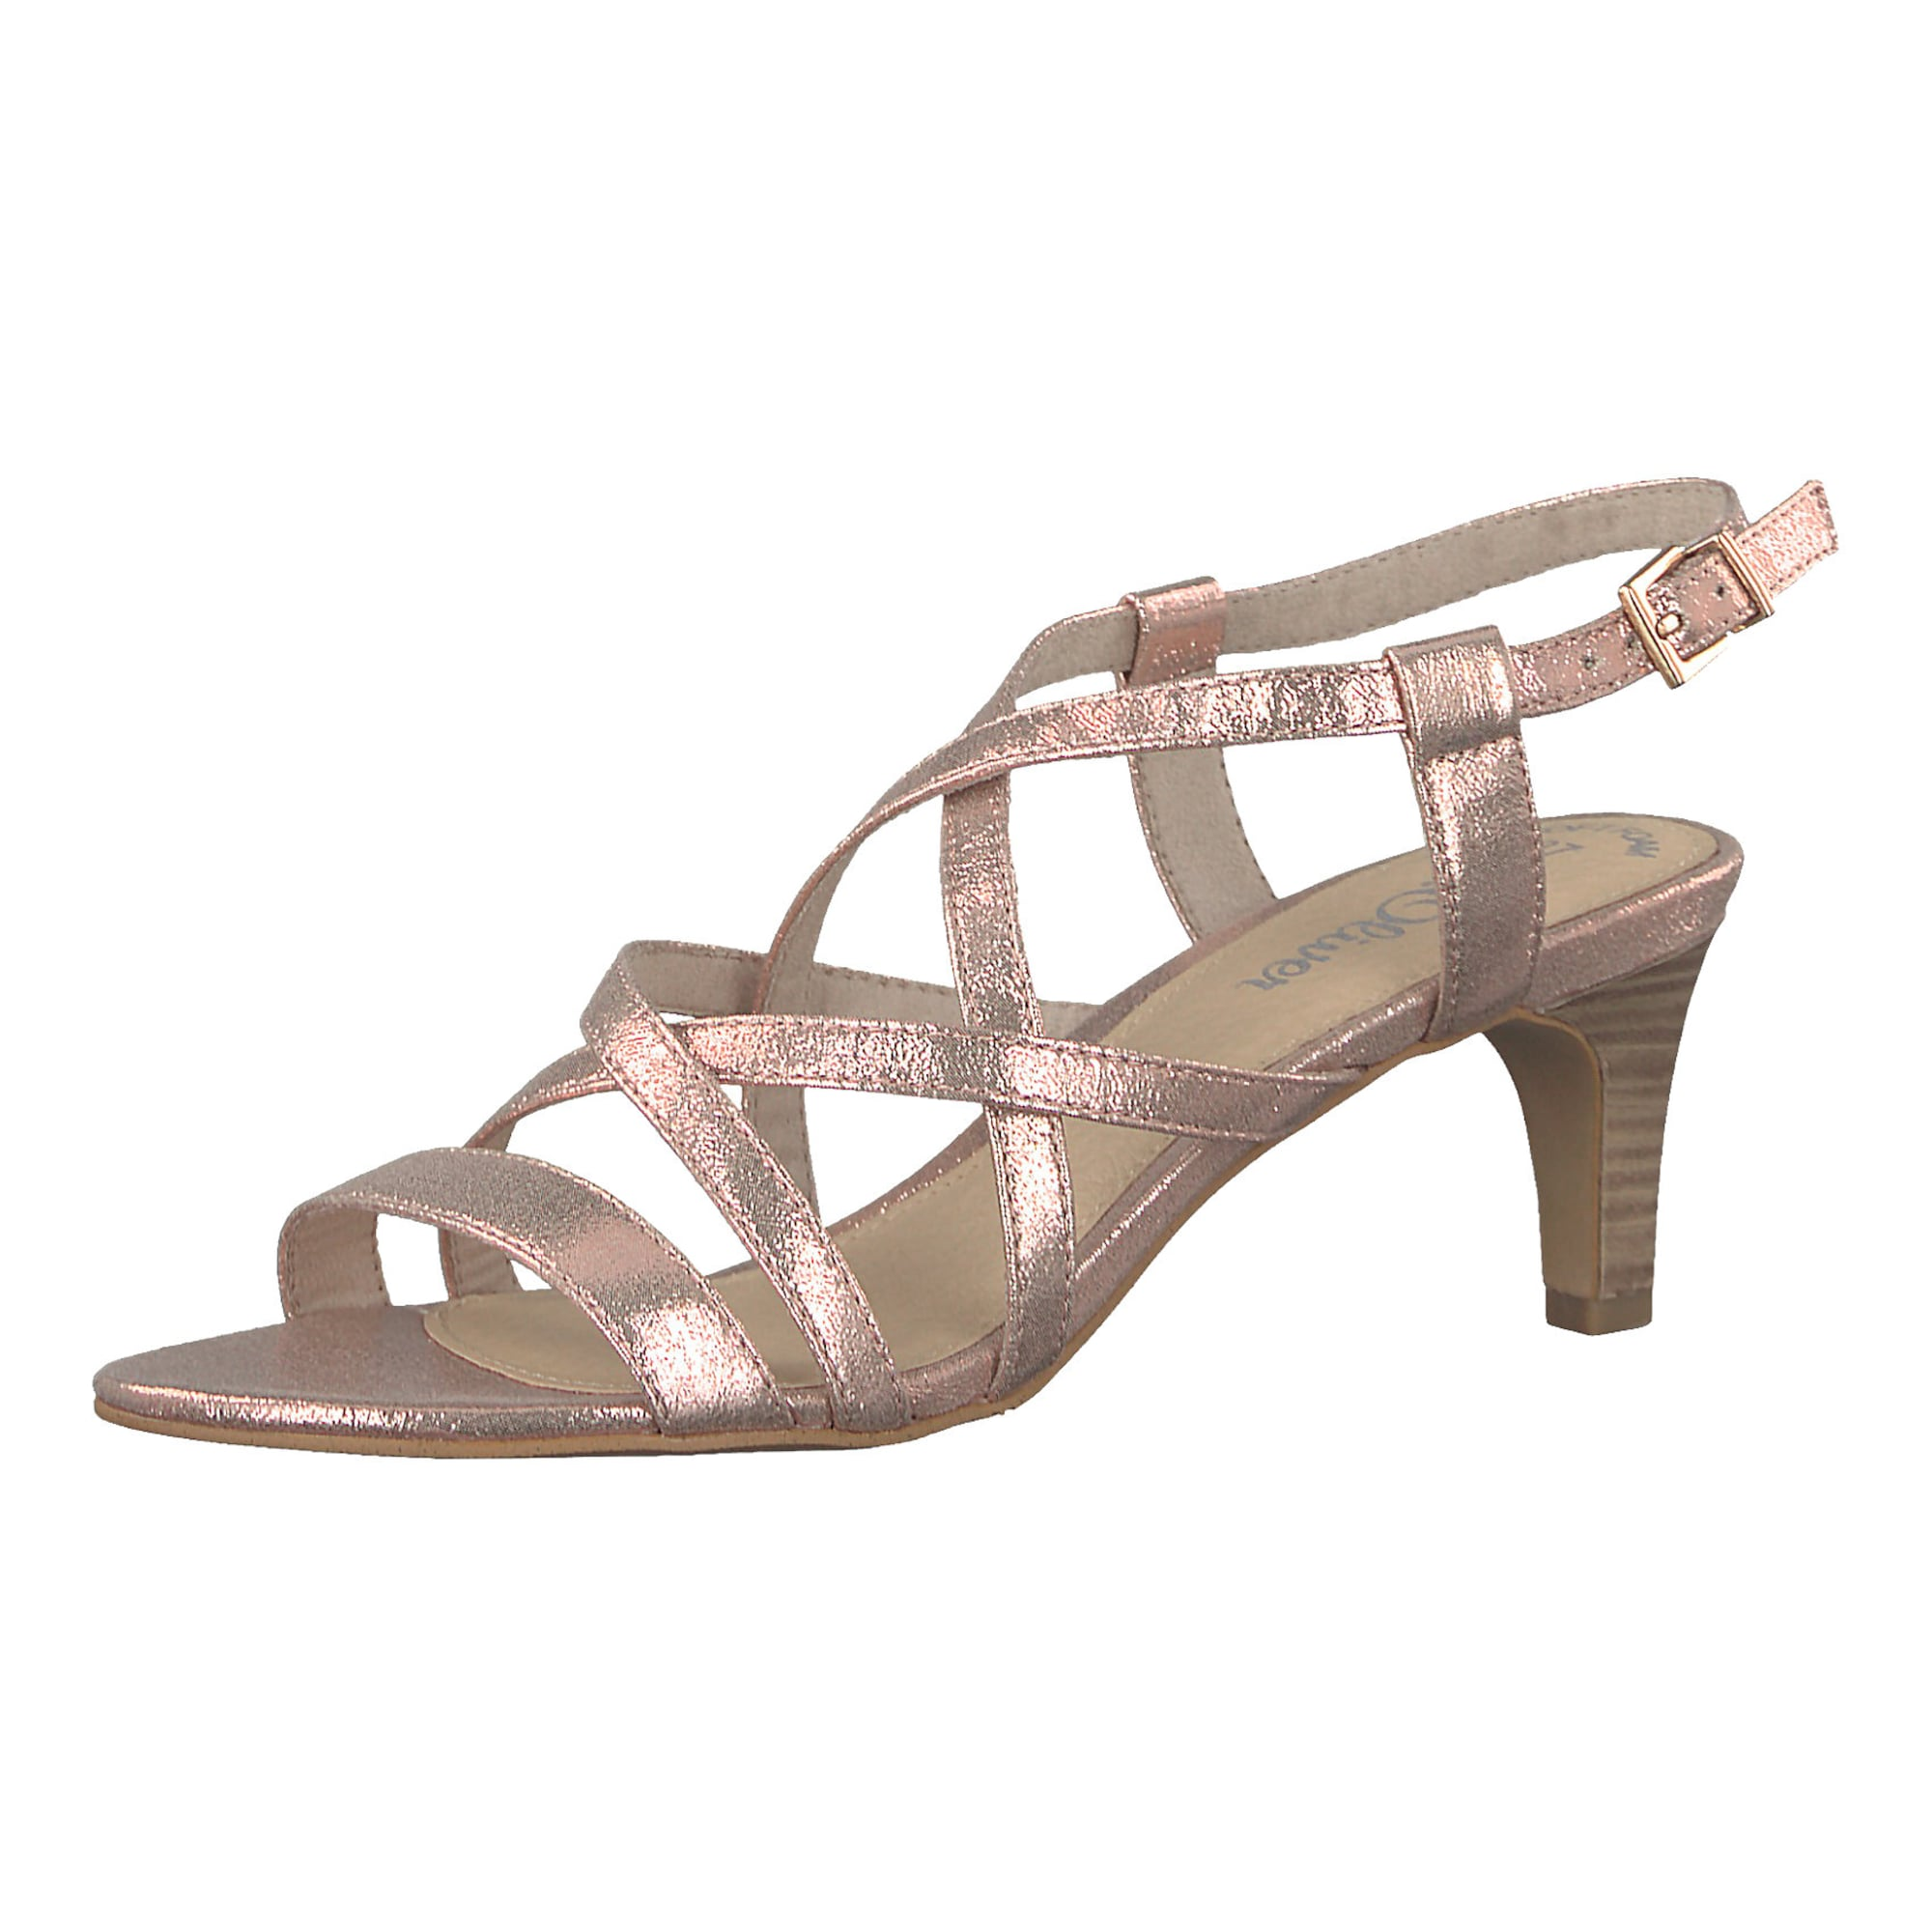 s.oliver - Klassische Sandaletten